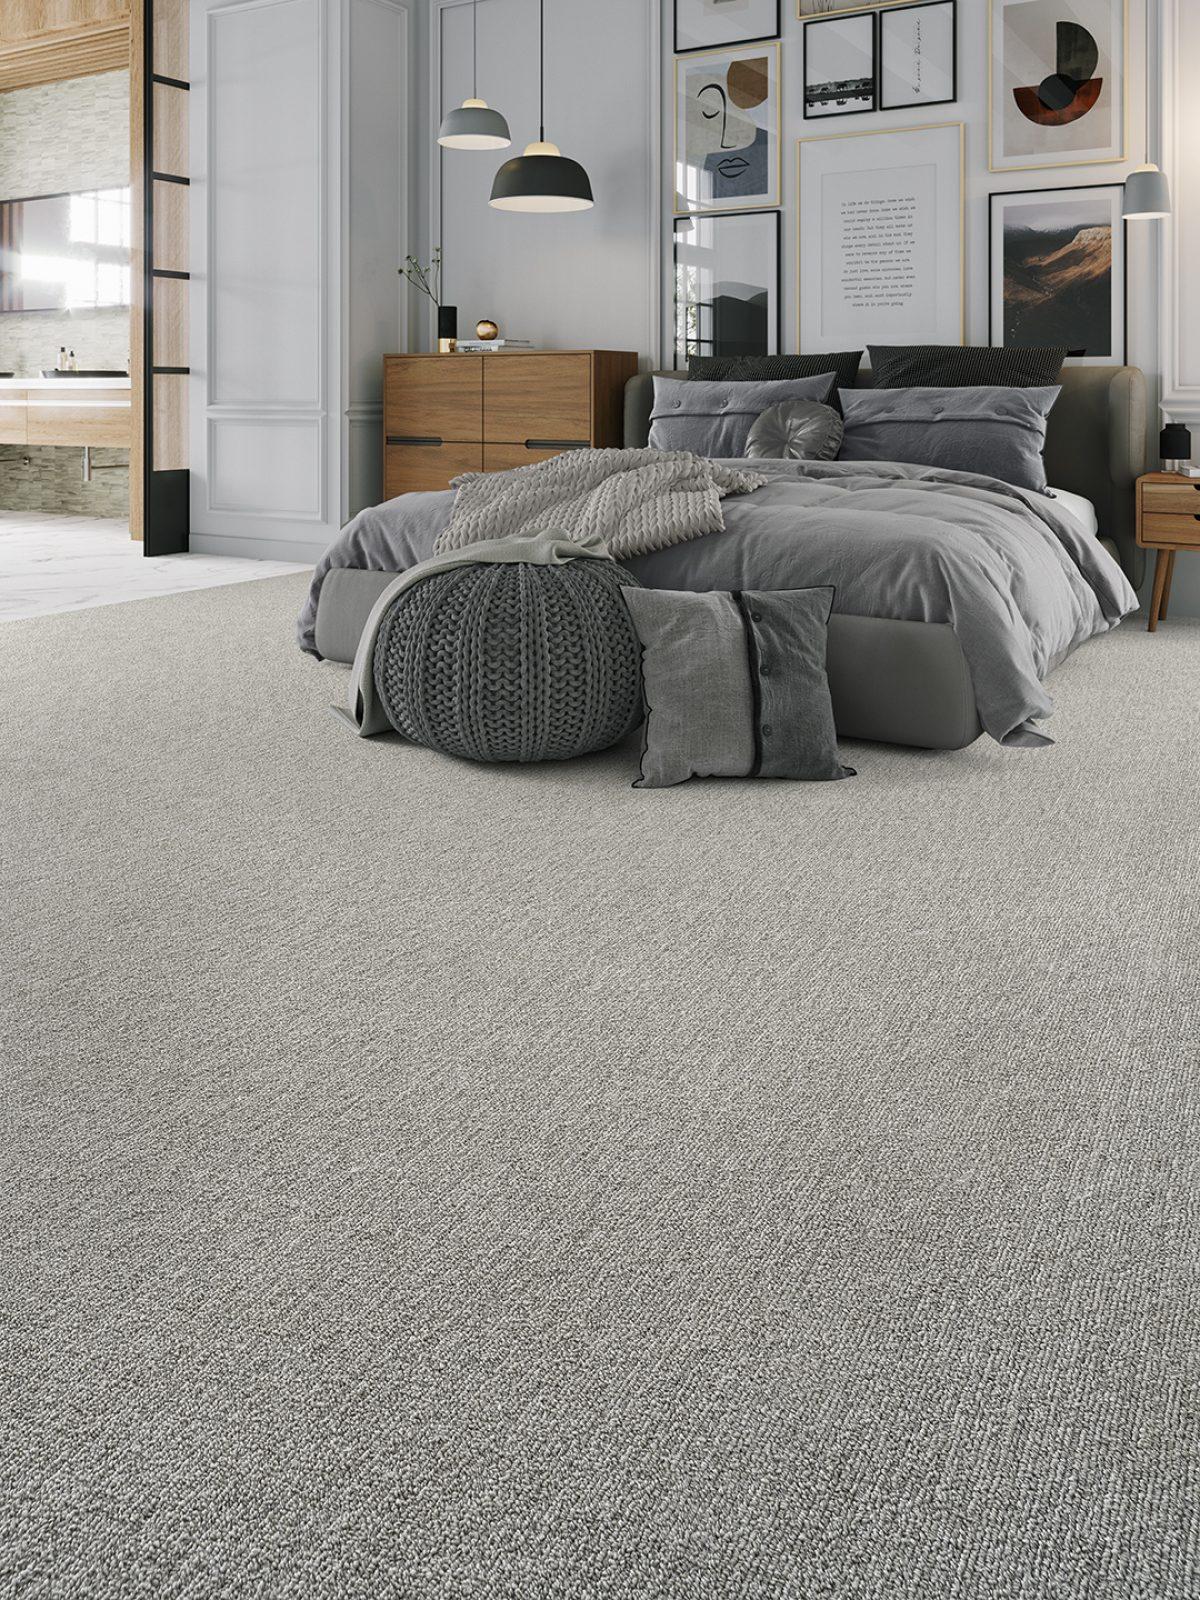 Phenix Flooring Expands Microban Partnership antimicrobial carpet